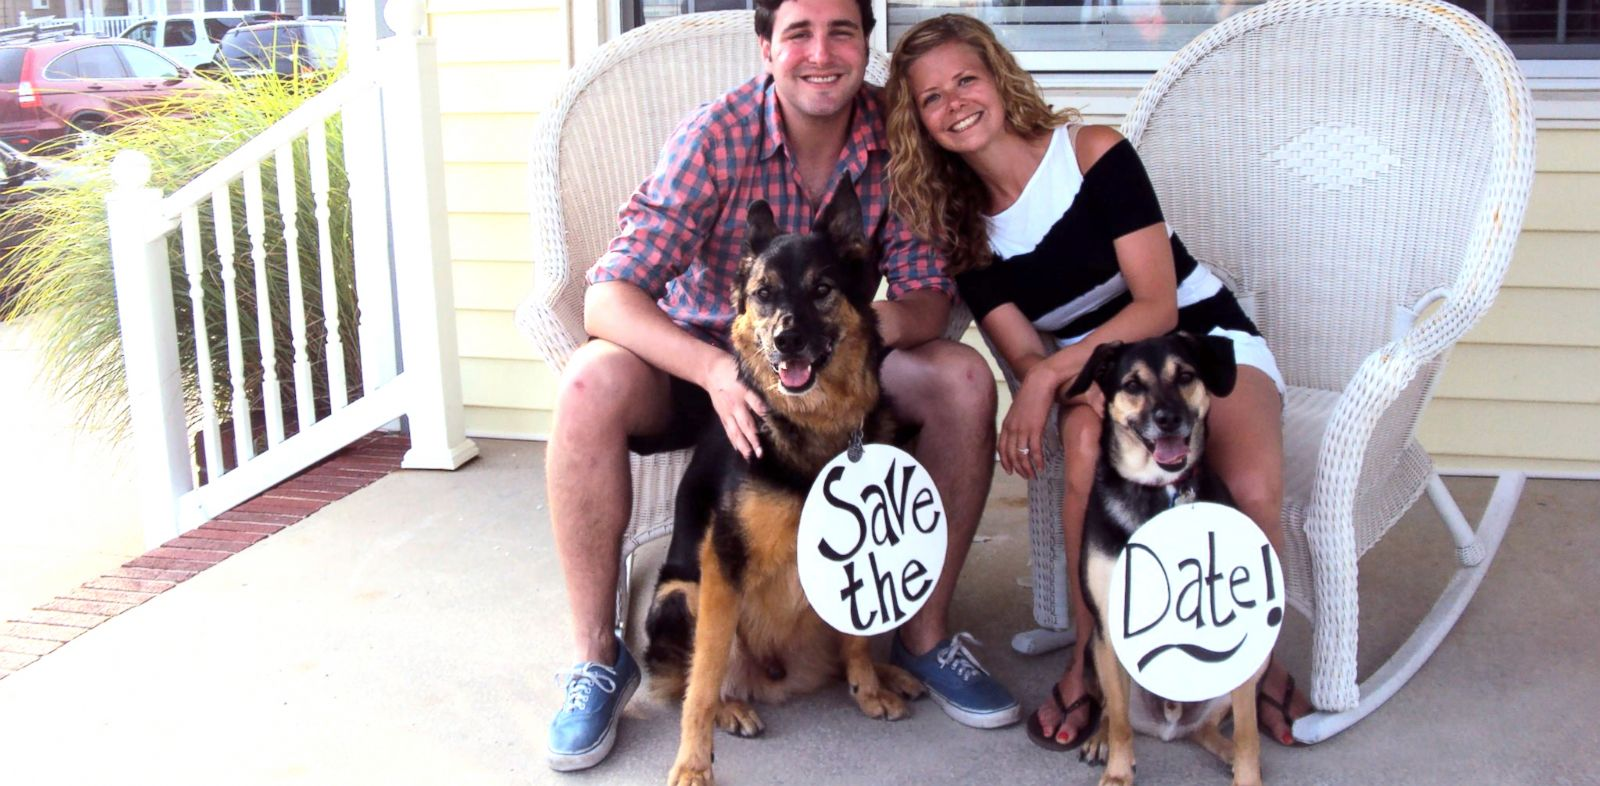 PHOTO: Jeff and Jodi Gillman and their dog Reuben, who has Hemangiosarcoma.